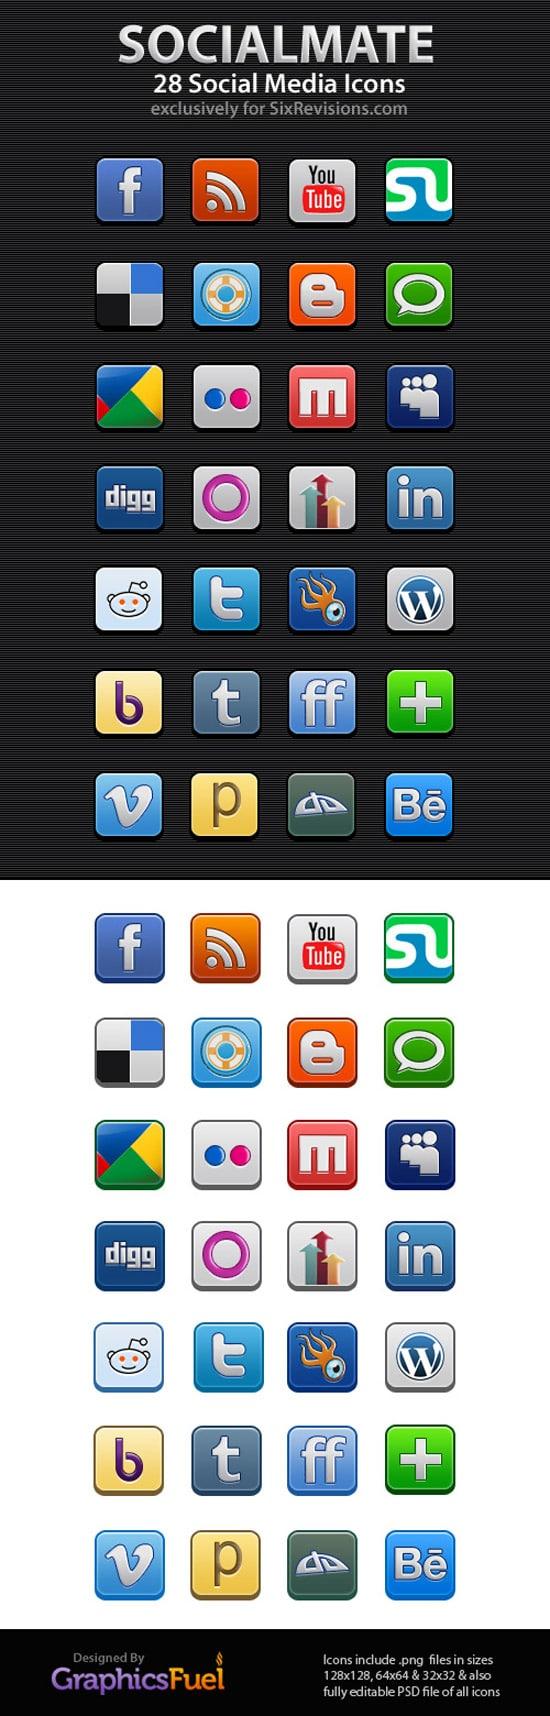 SocialMate: 28 Free Social Media Icons (Includes PSDs)